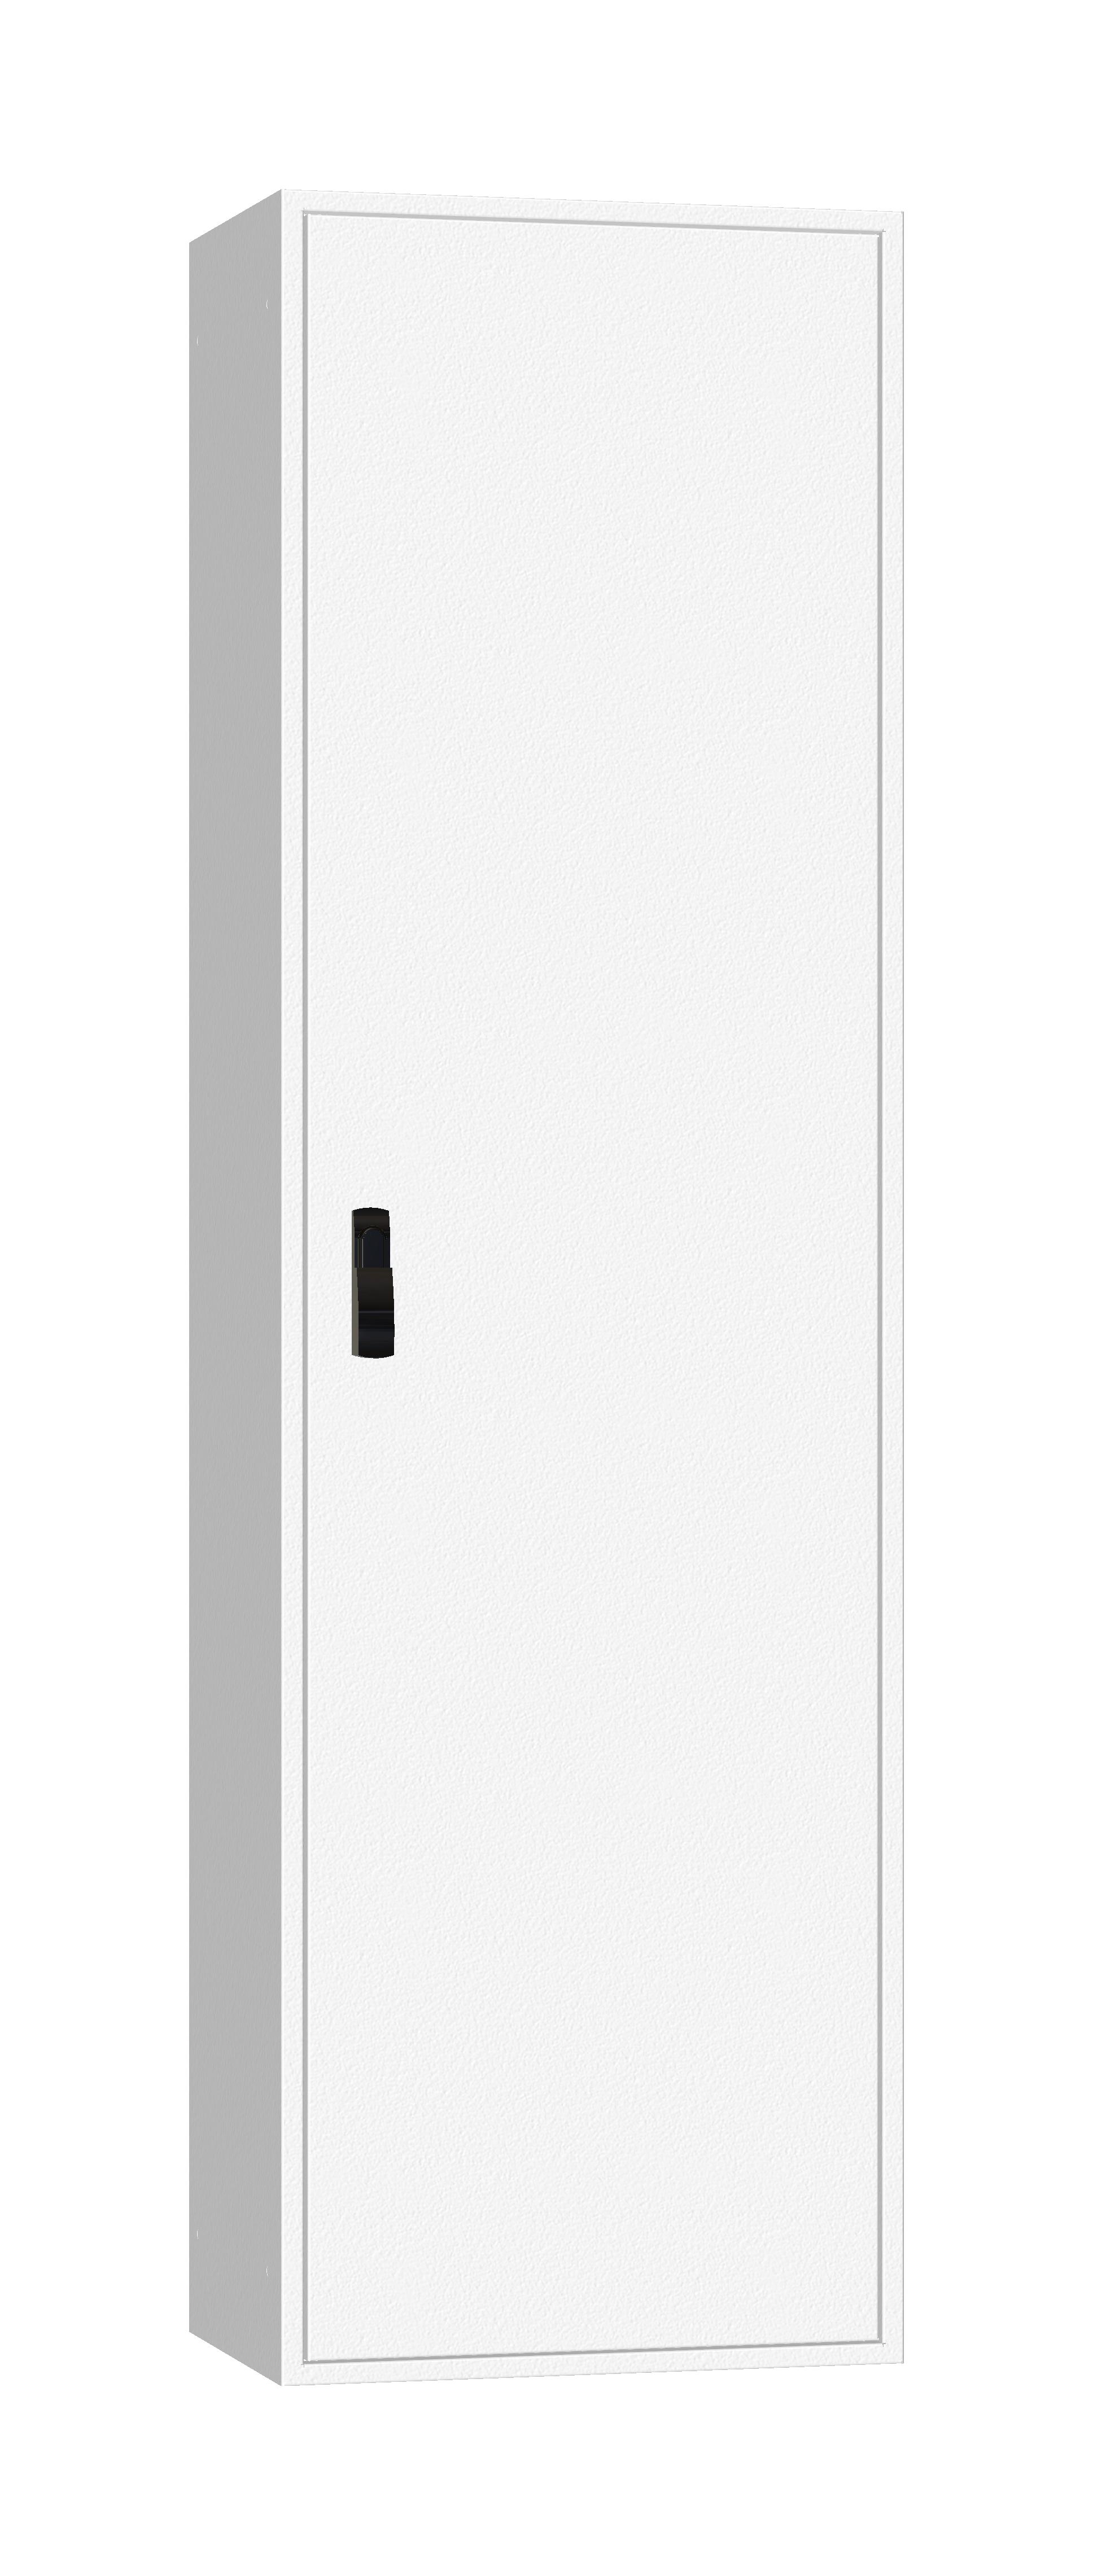 1 Stk AP-Rahmen + Tür 2A-42 T=400mm, Rückwand + Schwenkhebel, IP54 IL954242--